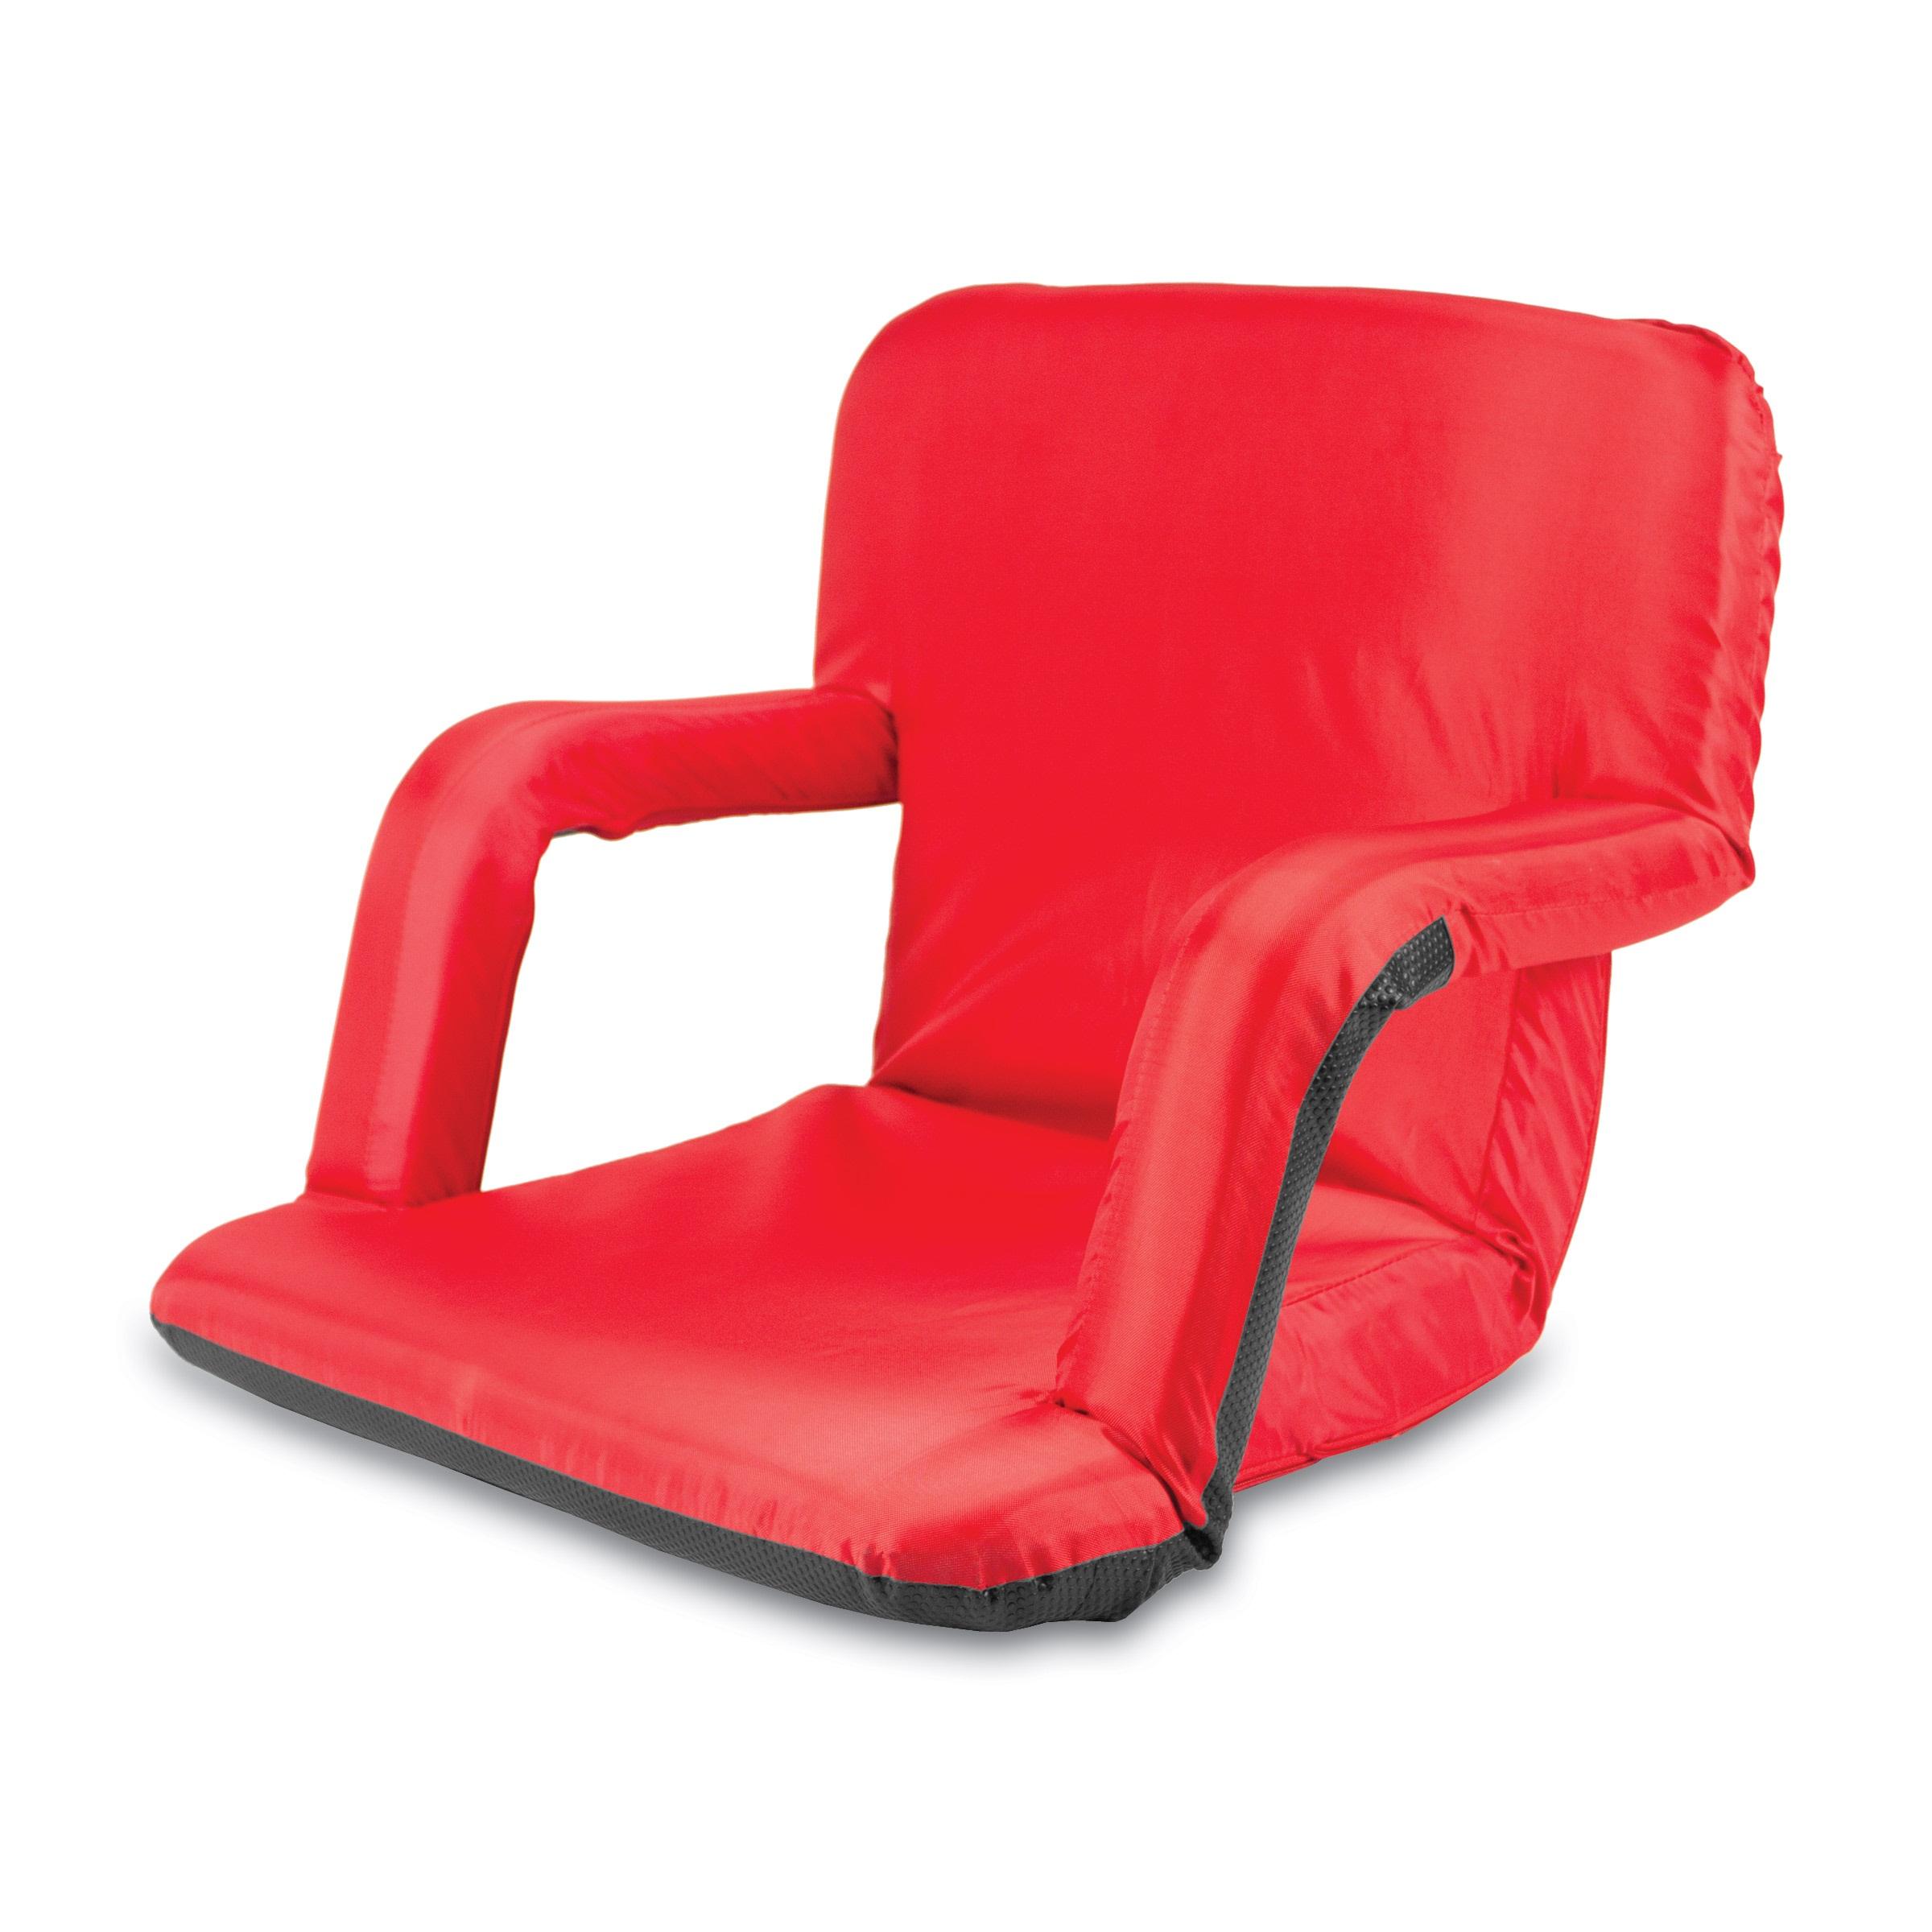 Picnic Time Ventura Seat Red